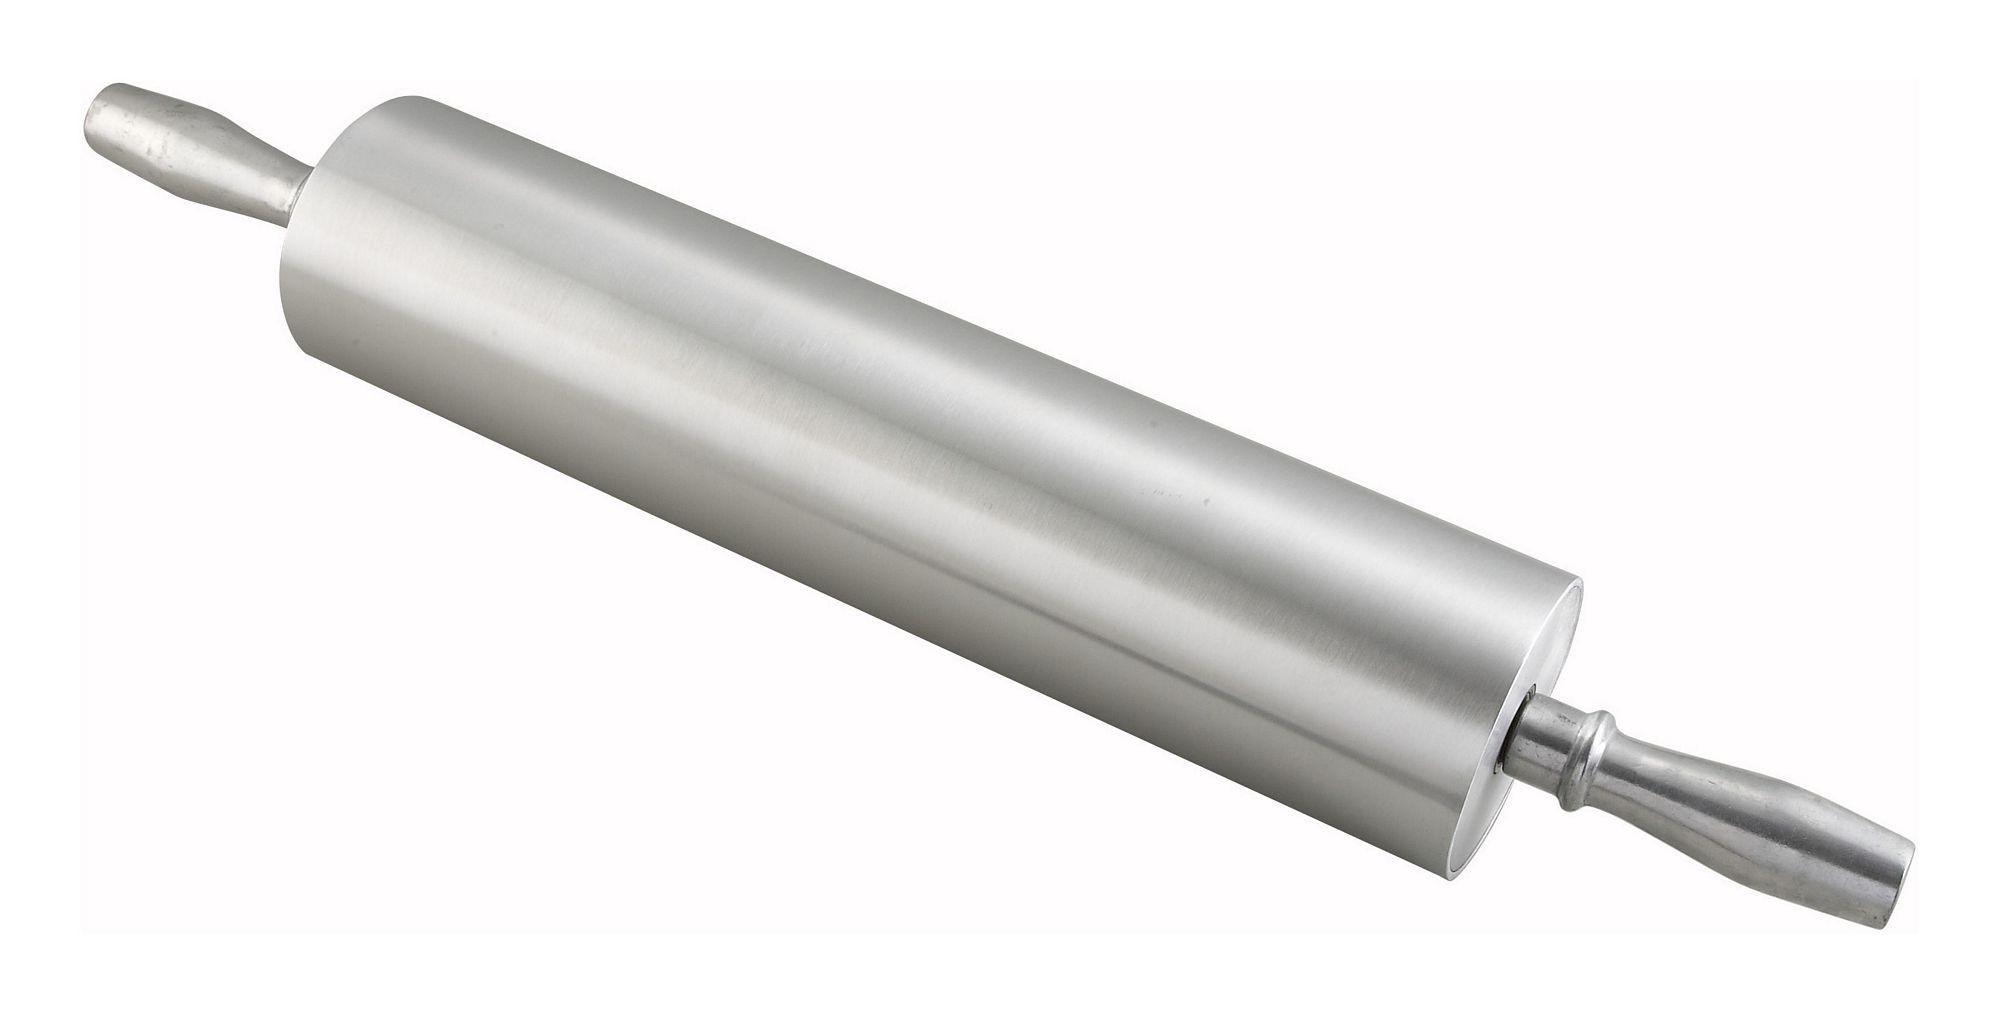 Aluminum Rolling Pin - 15